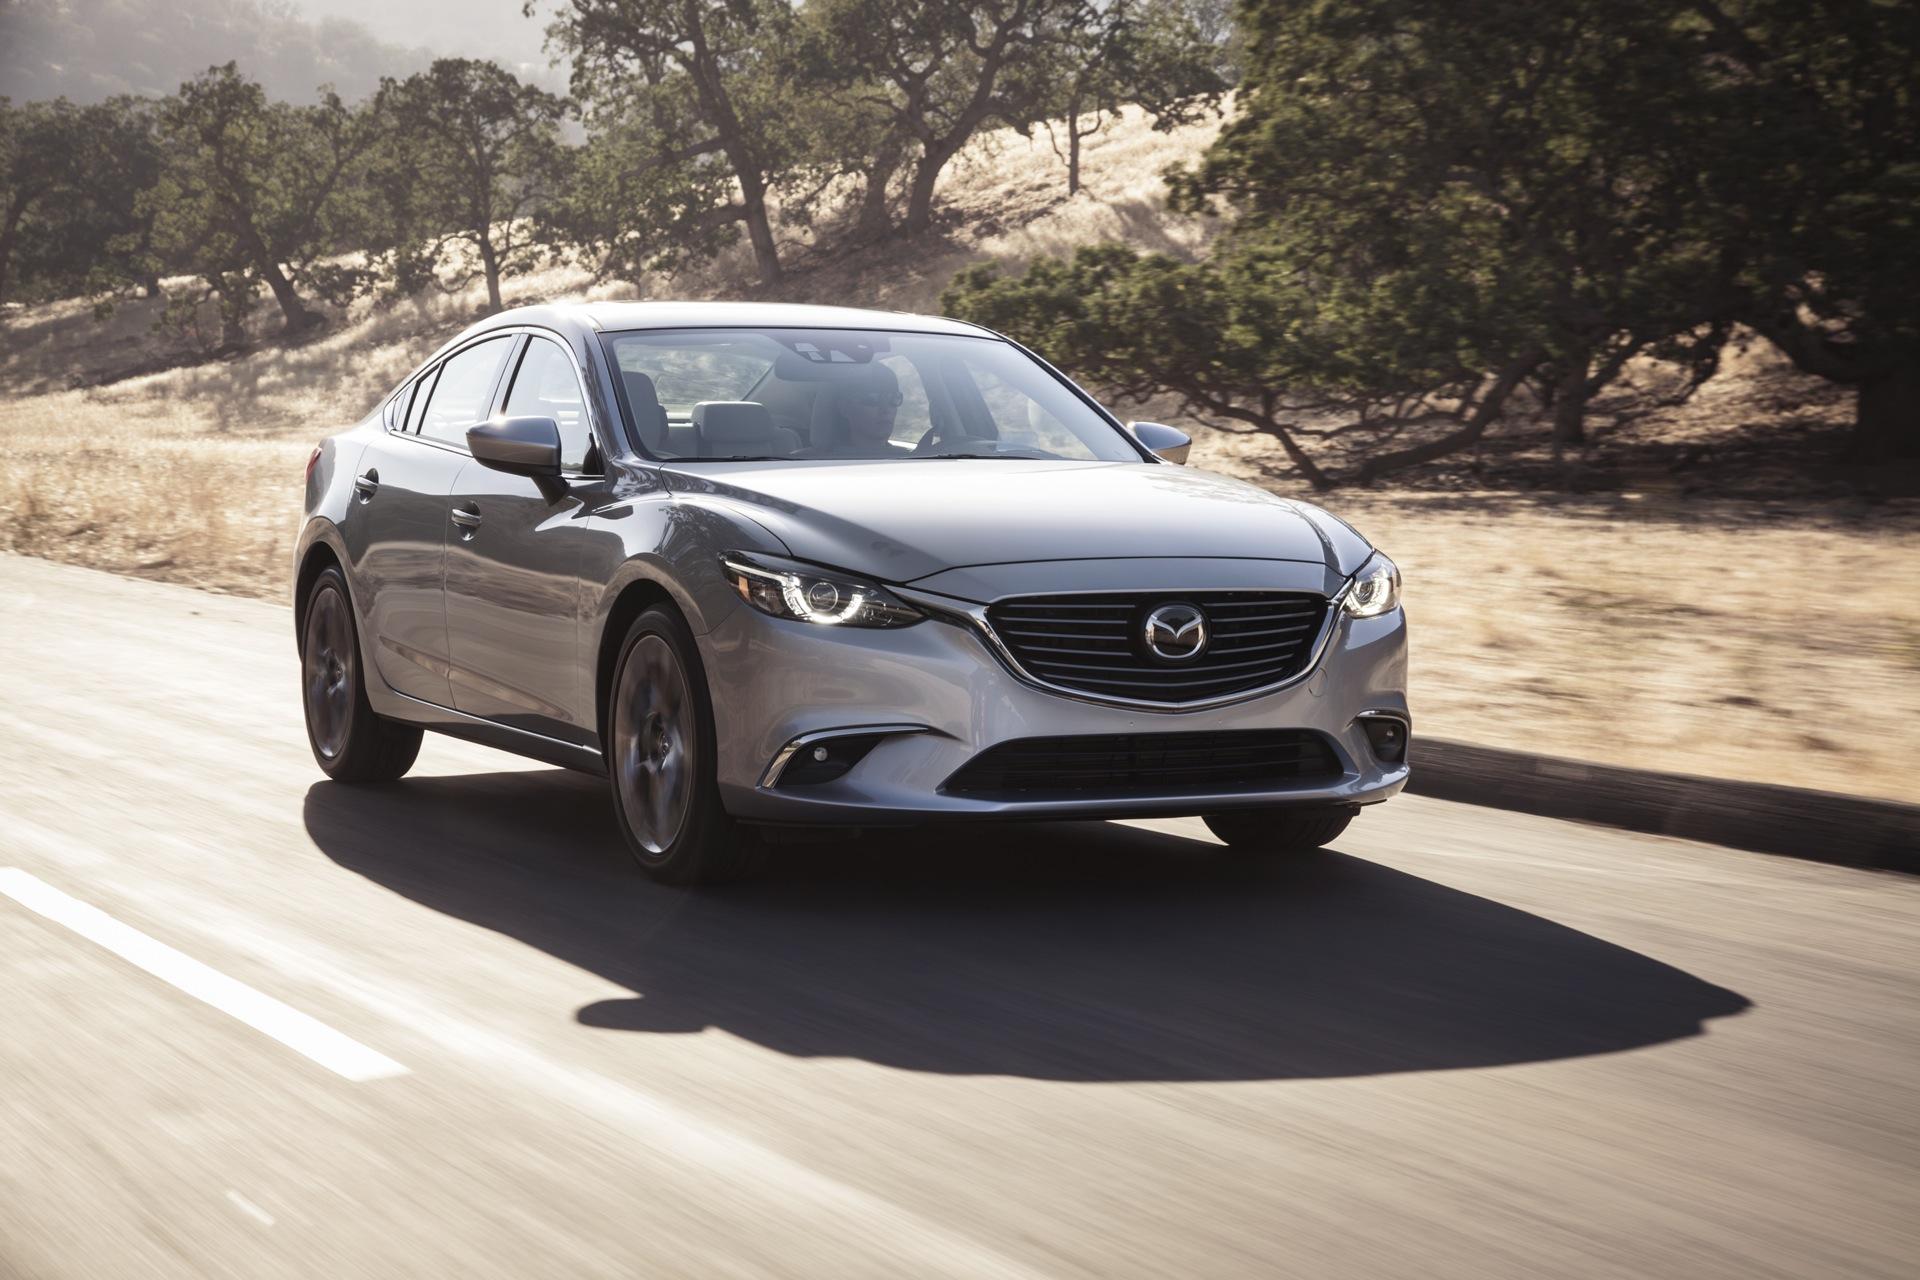 Kelebihan Mazda 6 2.5 Spesifikasi